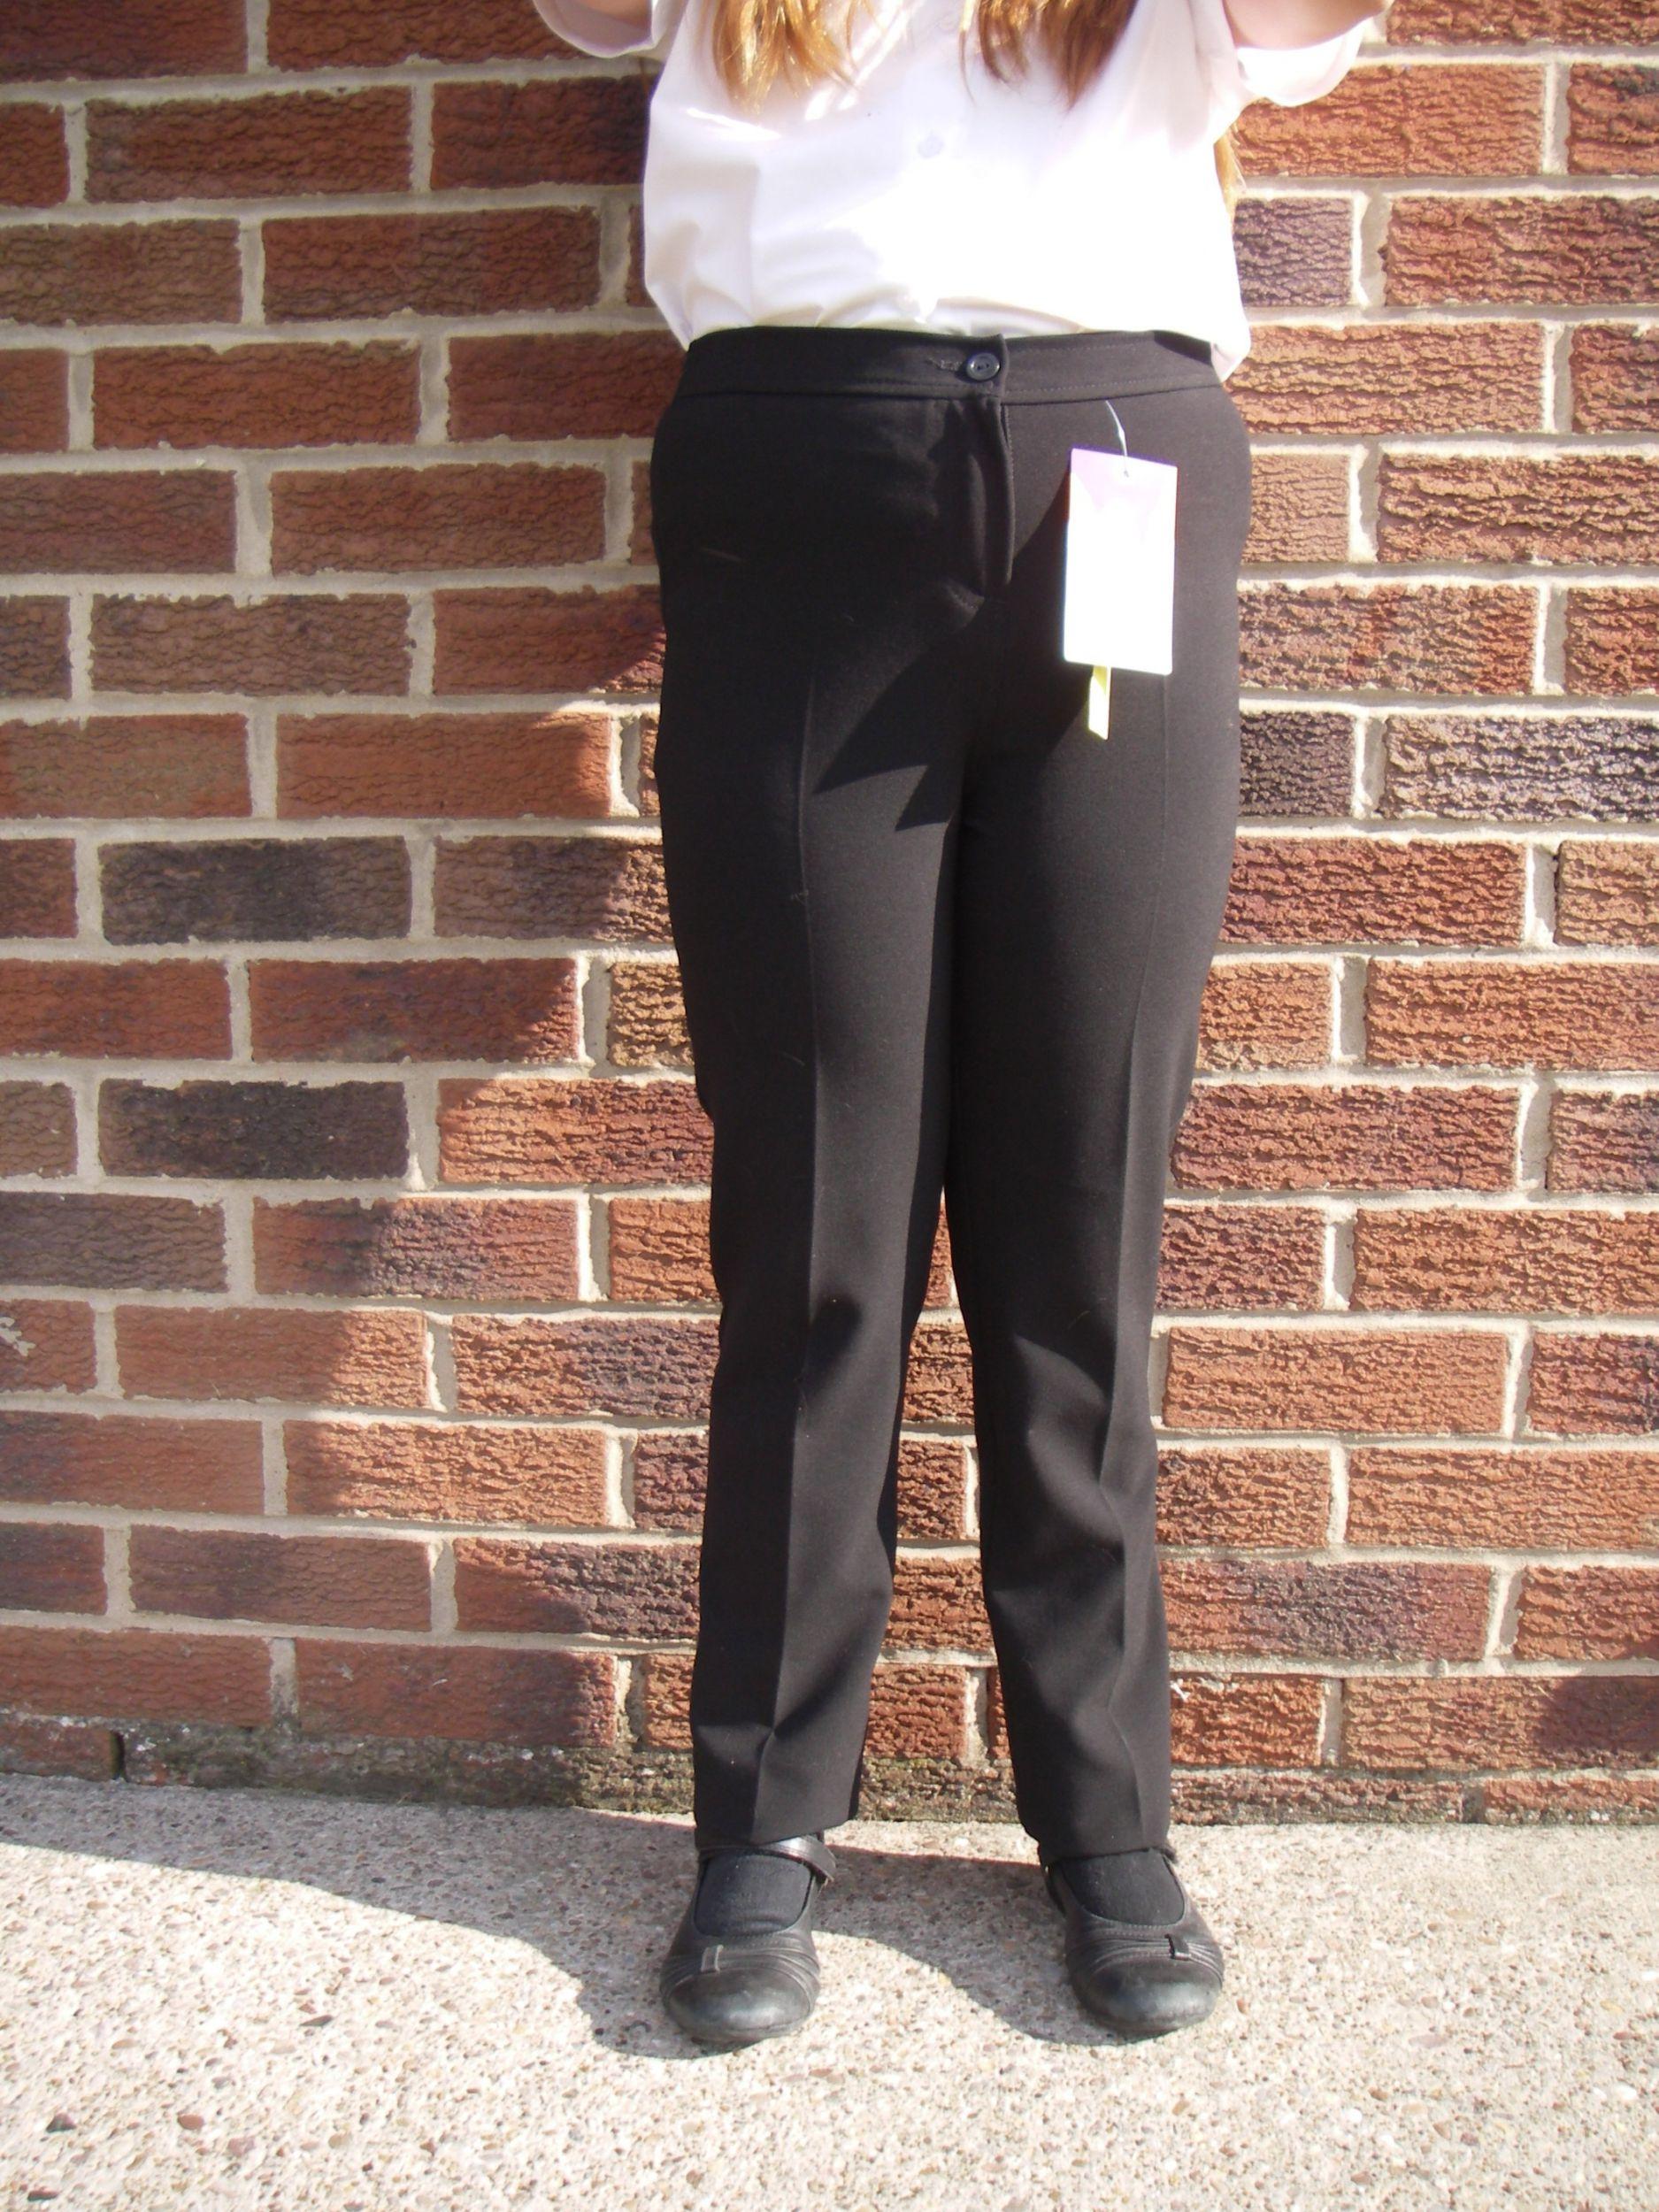 Graham Winterbottom Slim Cut Girls School Trousers Senior